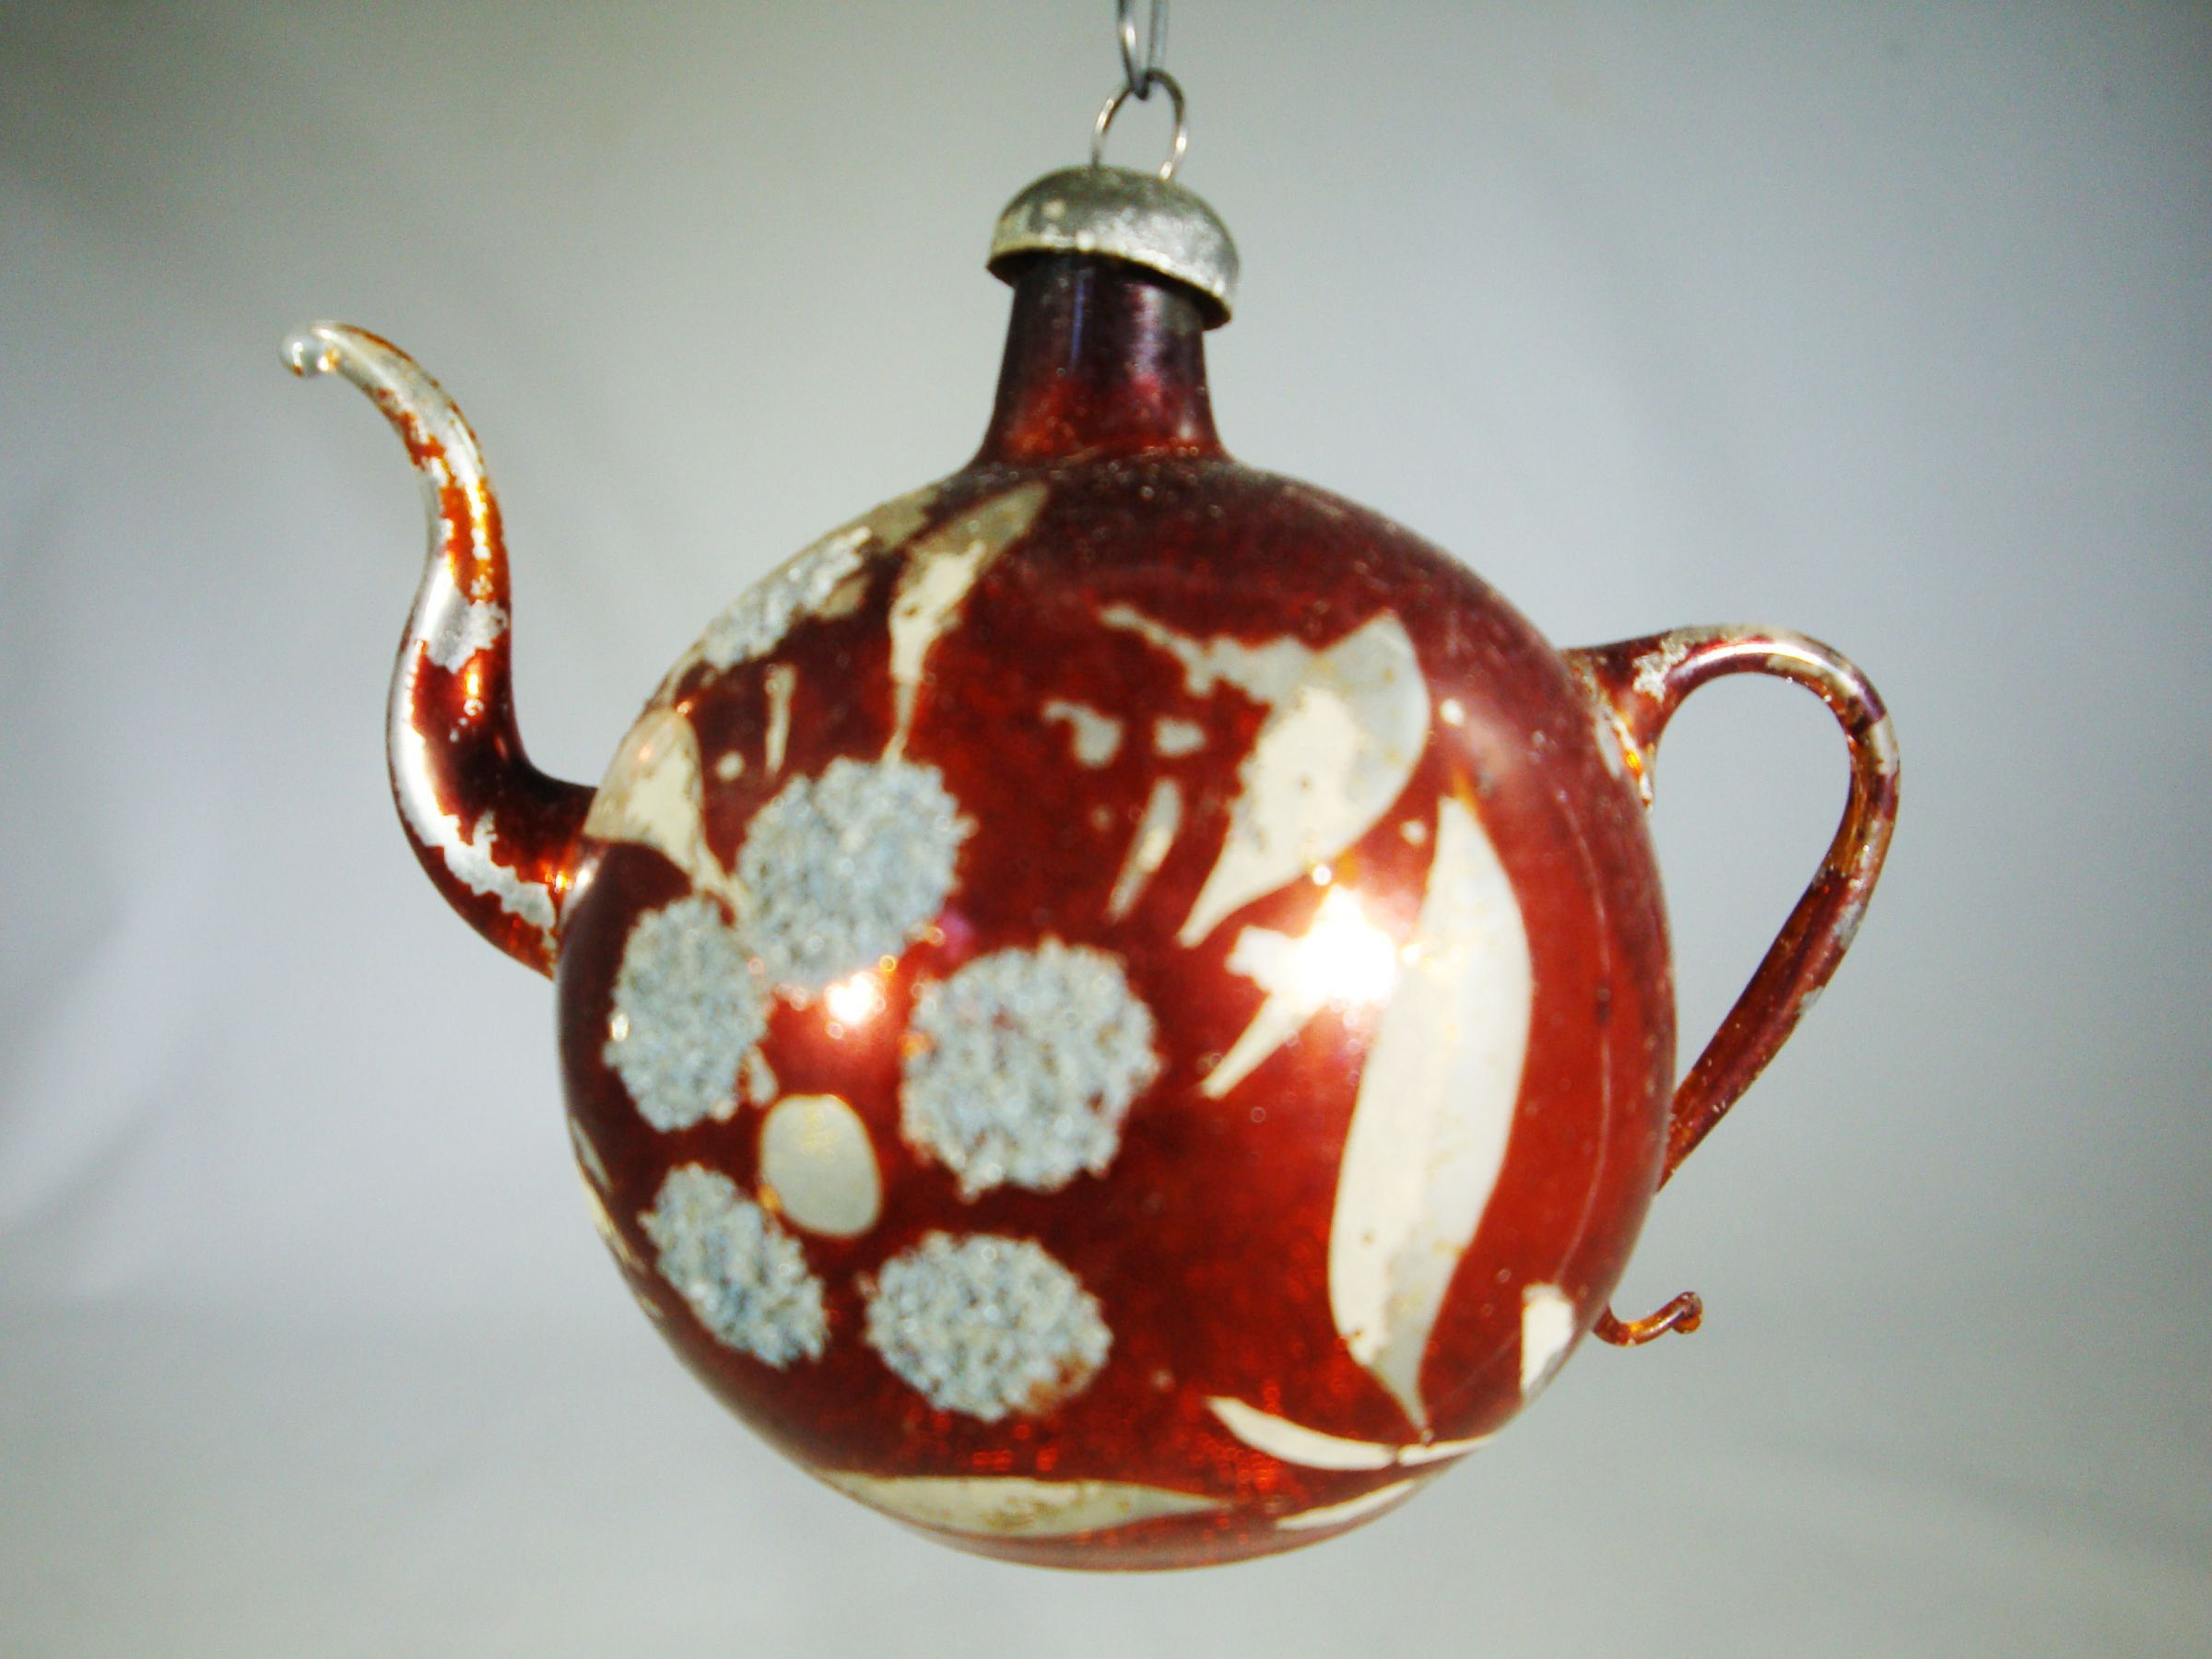 Lauscha Germany Glass Teapot Ornament Antique Early 1900 S German Hand Blown Glass Teapot Ornamen Teapot Ornament Antique Christmas Ornaments Hand Blown Glass